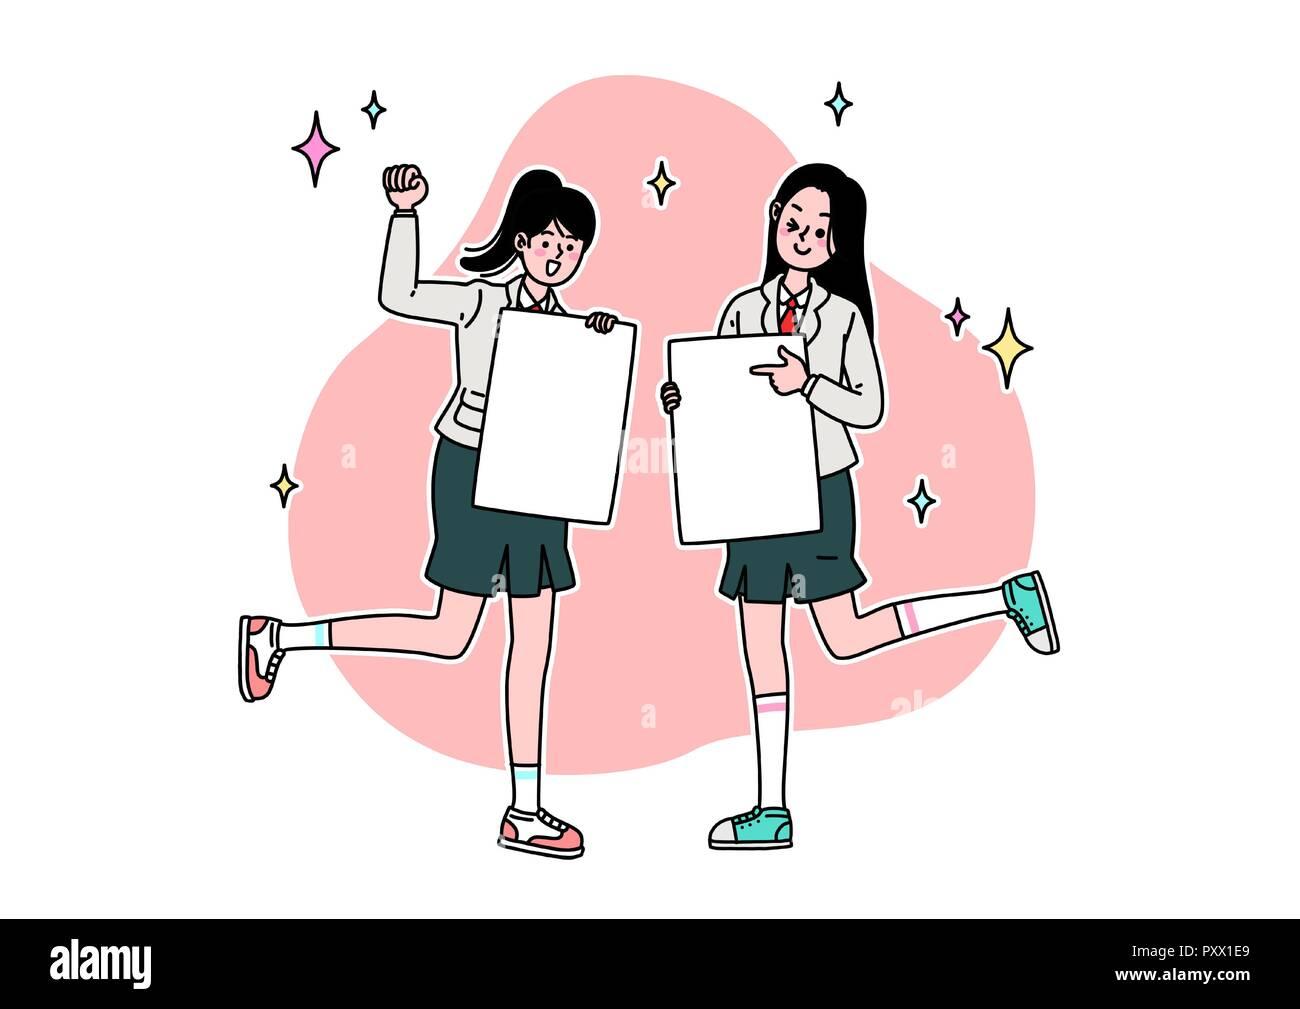 School Life Cartoon Teenagers Middle And High School Students Vector Illustration 009 Stock Vector Image Art Alamy